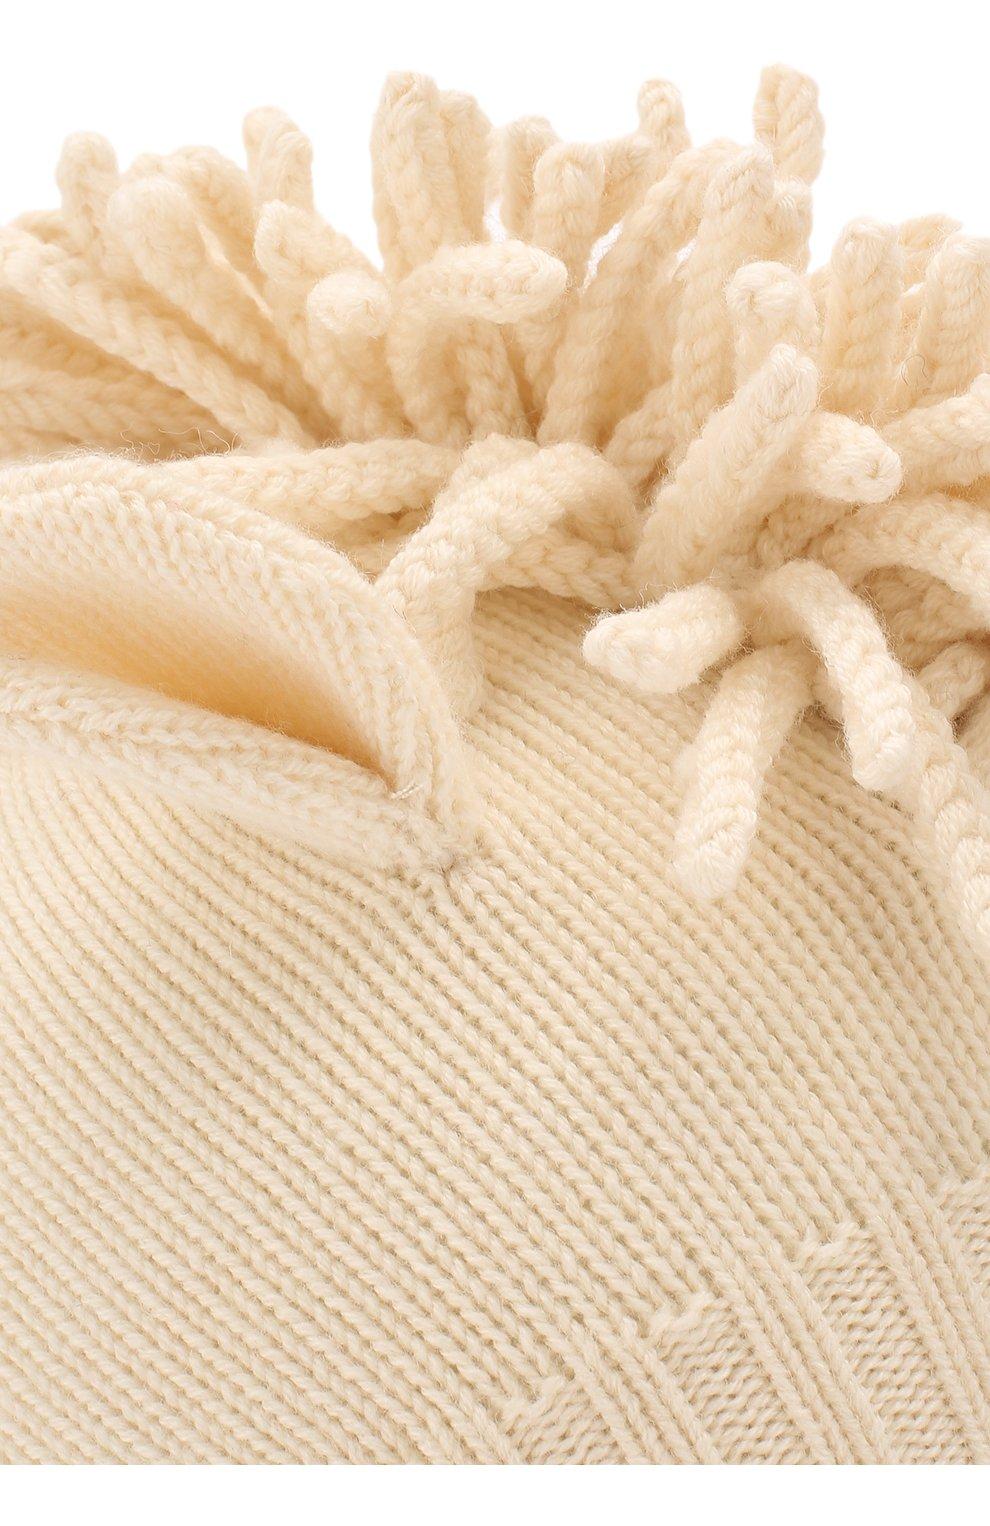 Детского шапка из шерсти и кашемира BURBERRY бежевого цвета, арт. 8016659 | Фото 3